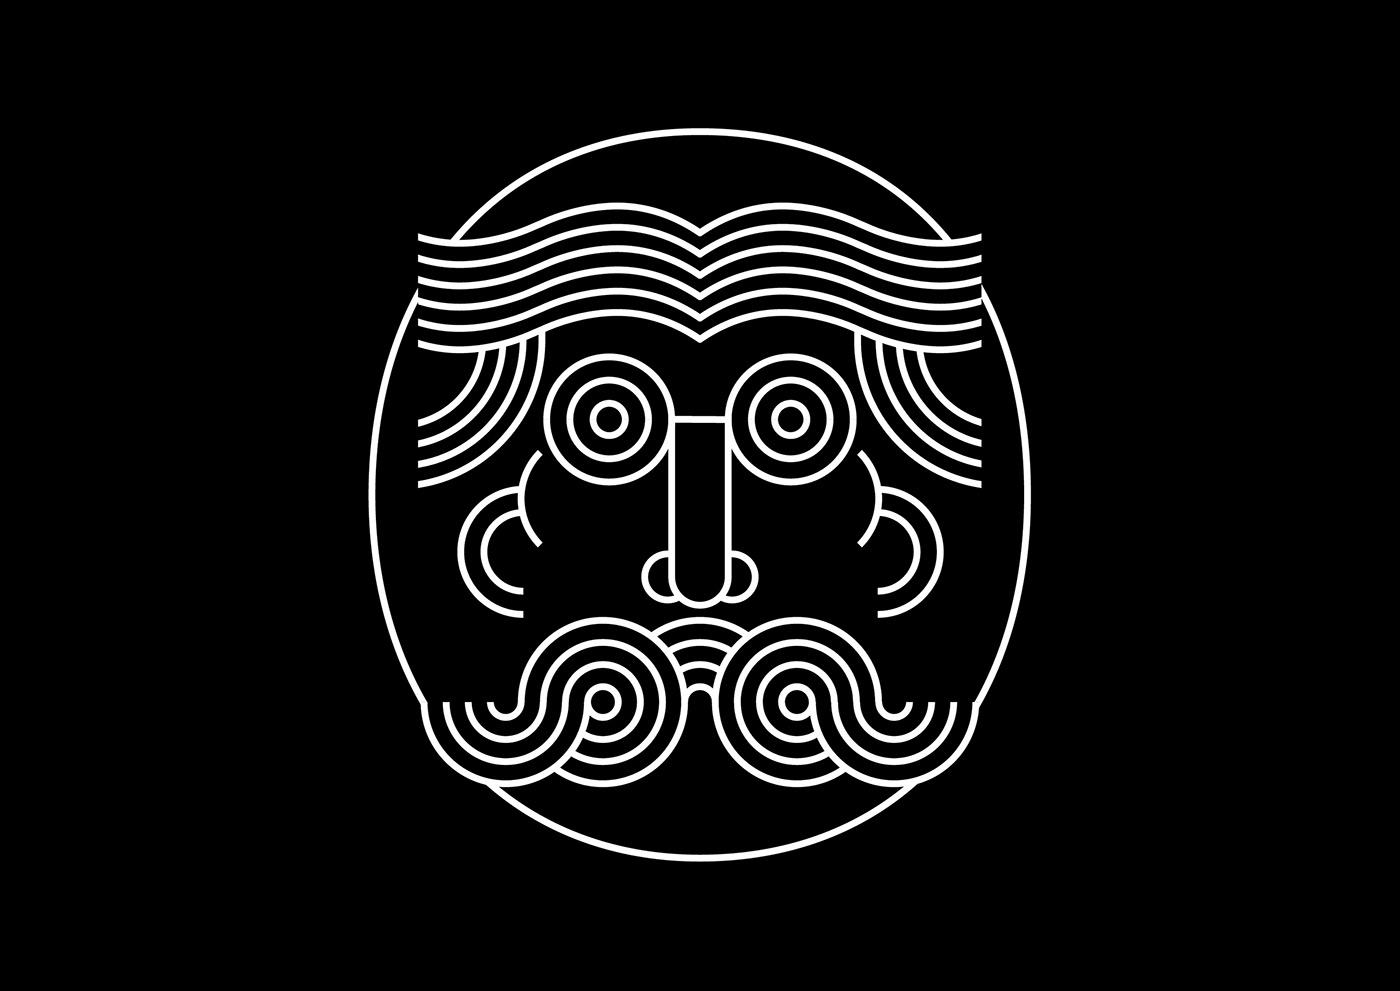 brand identity branding  Coffee graphic design  logo Macao macao design macau package design  untitled macao